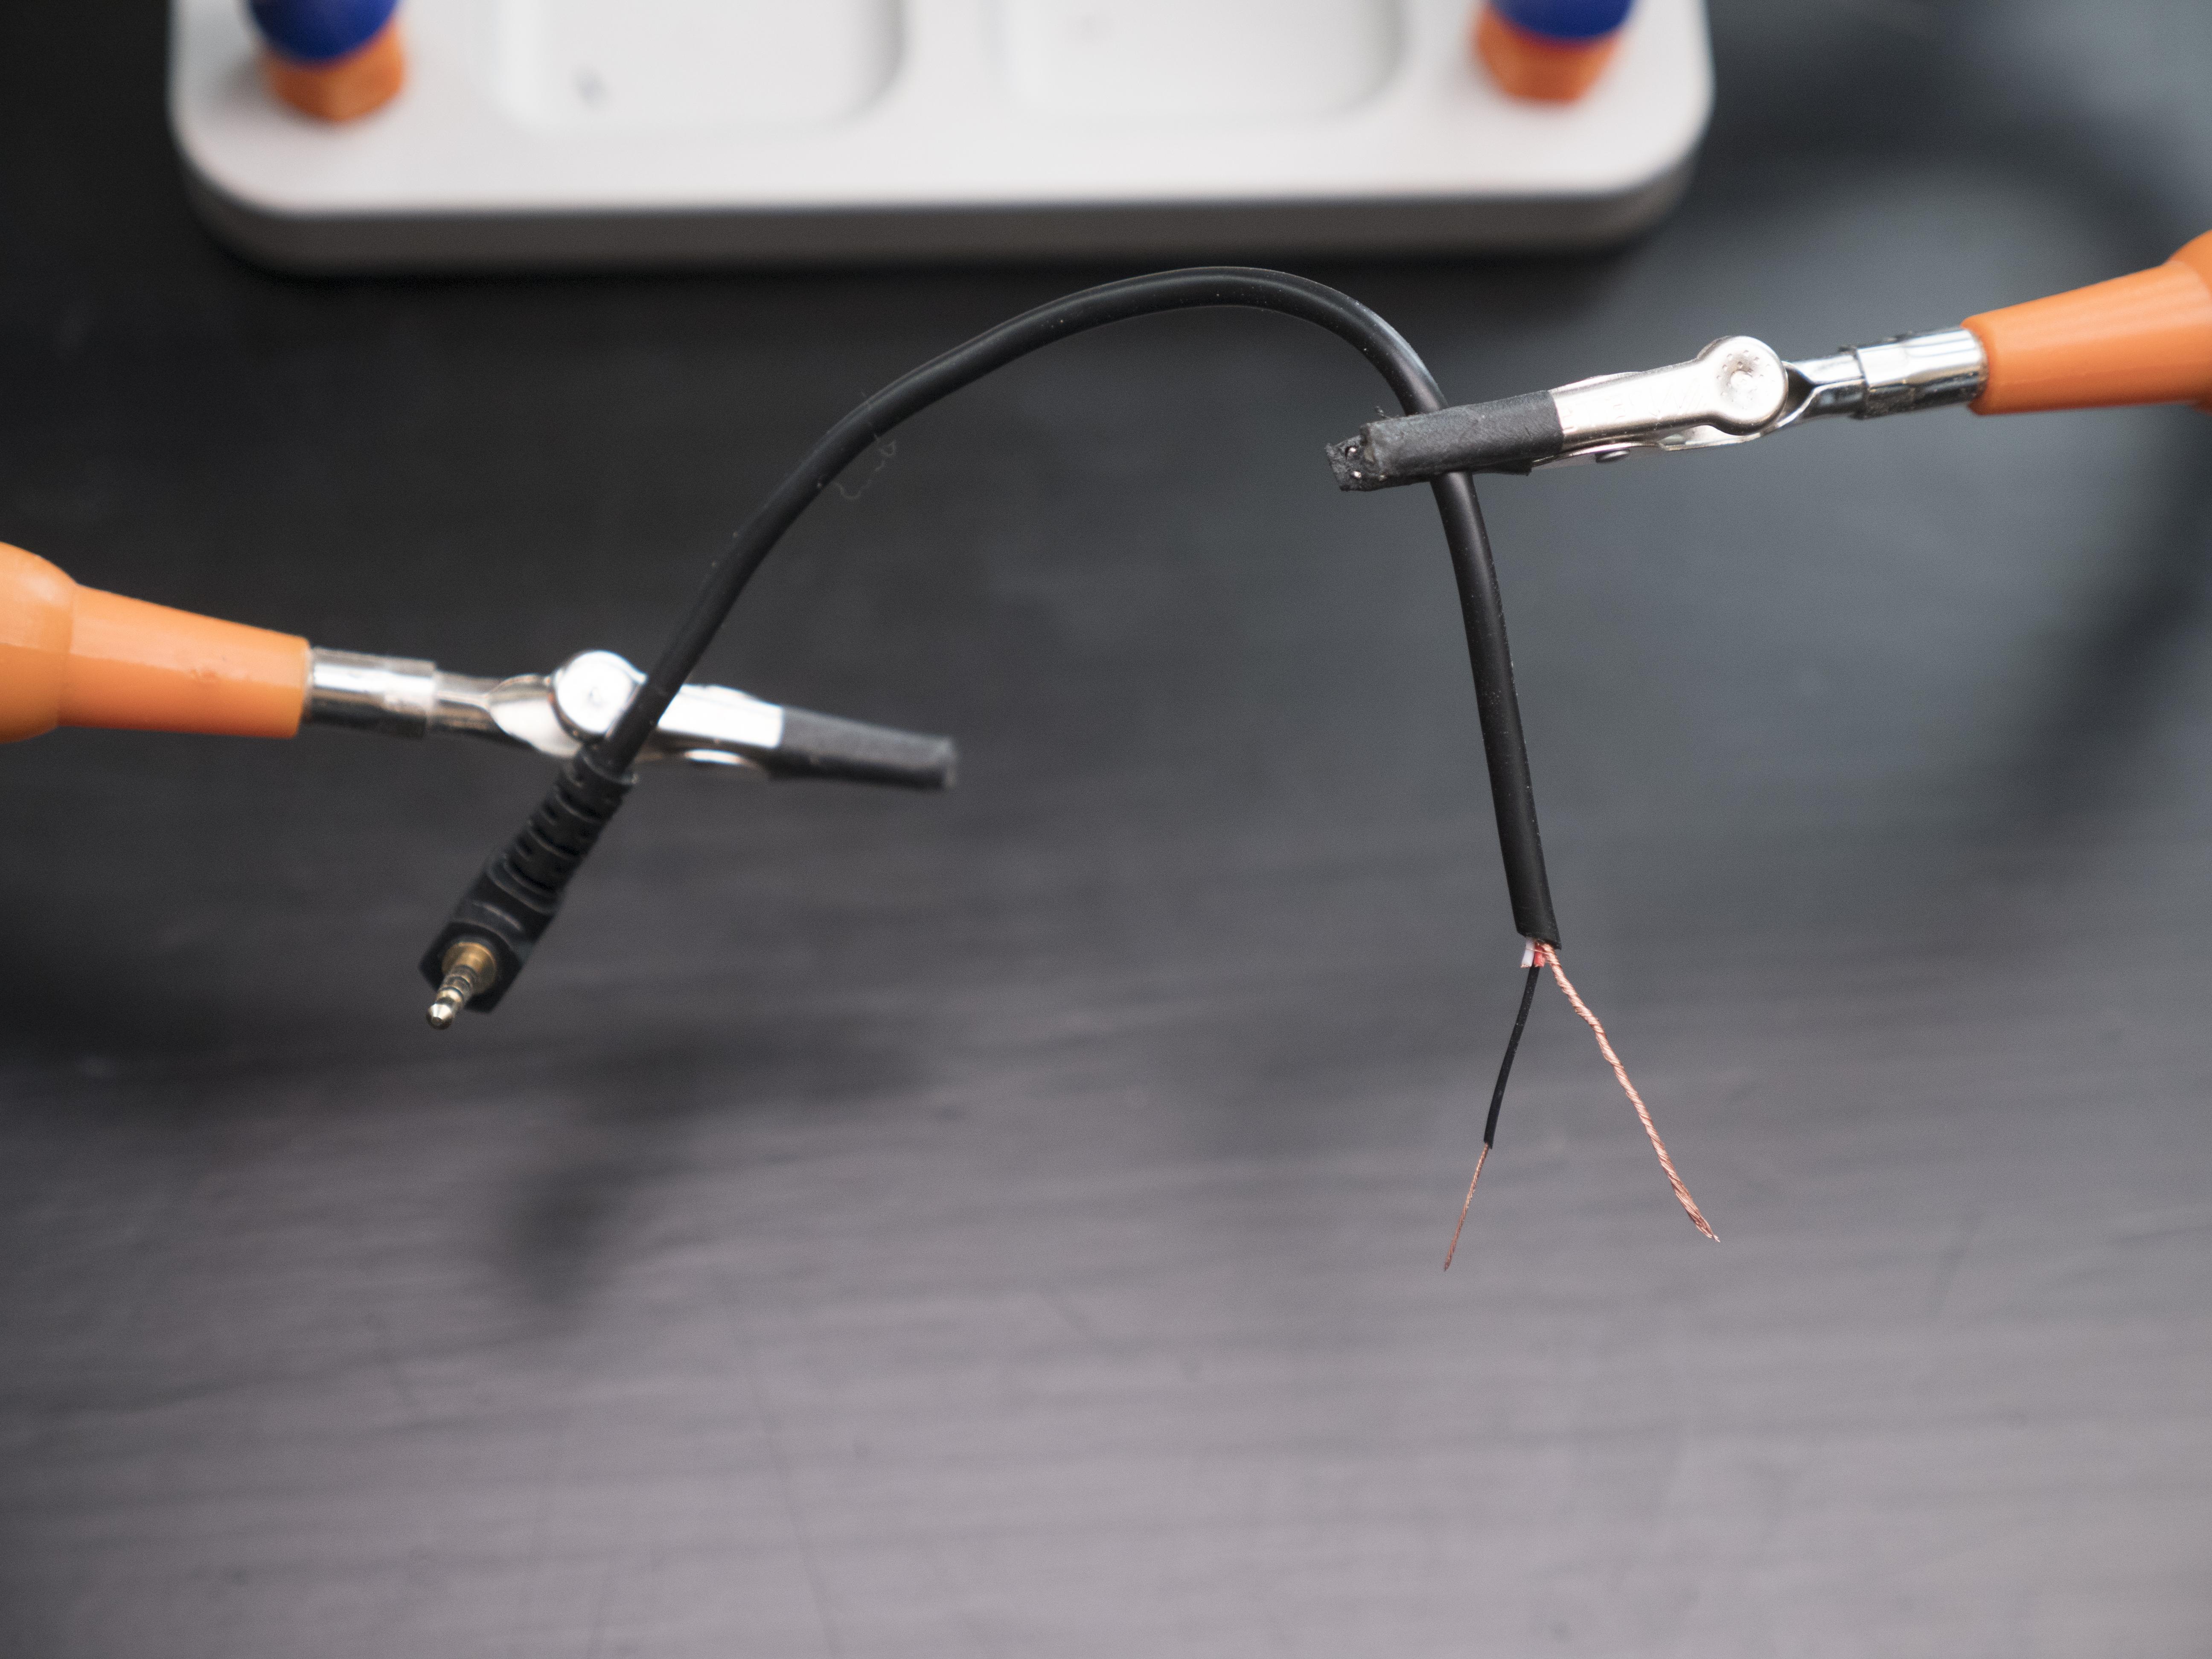 Picture of Prepare 2.5mm Connector